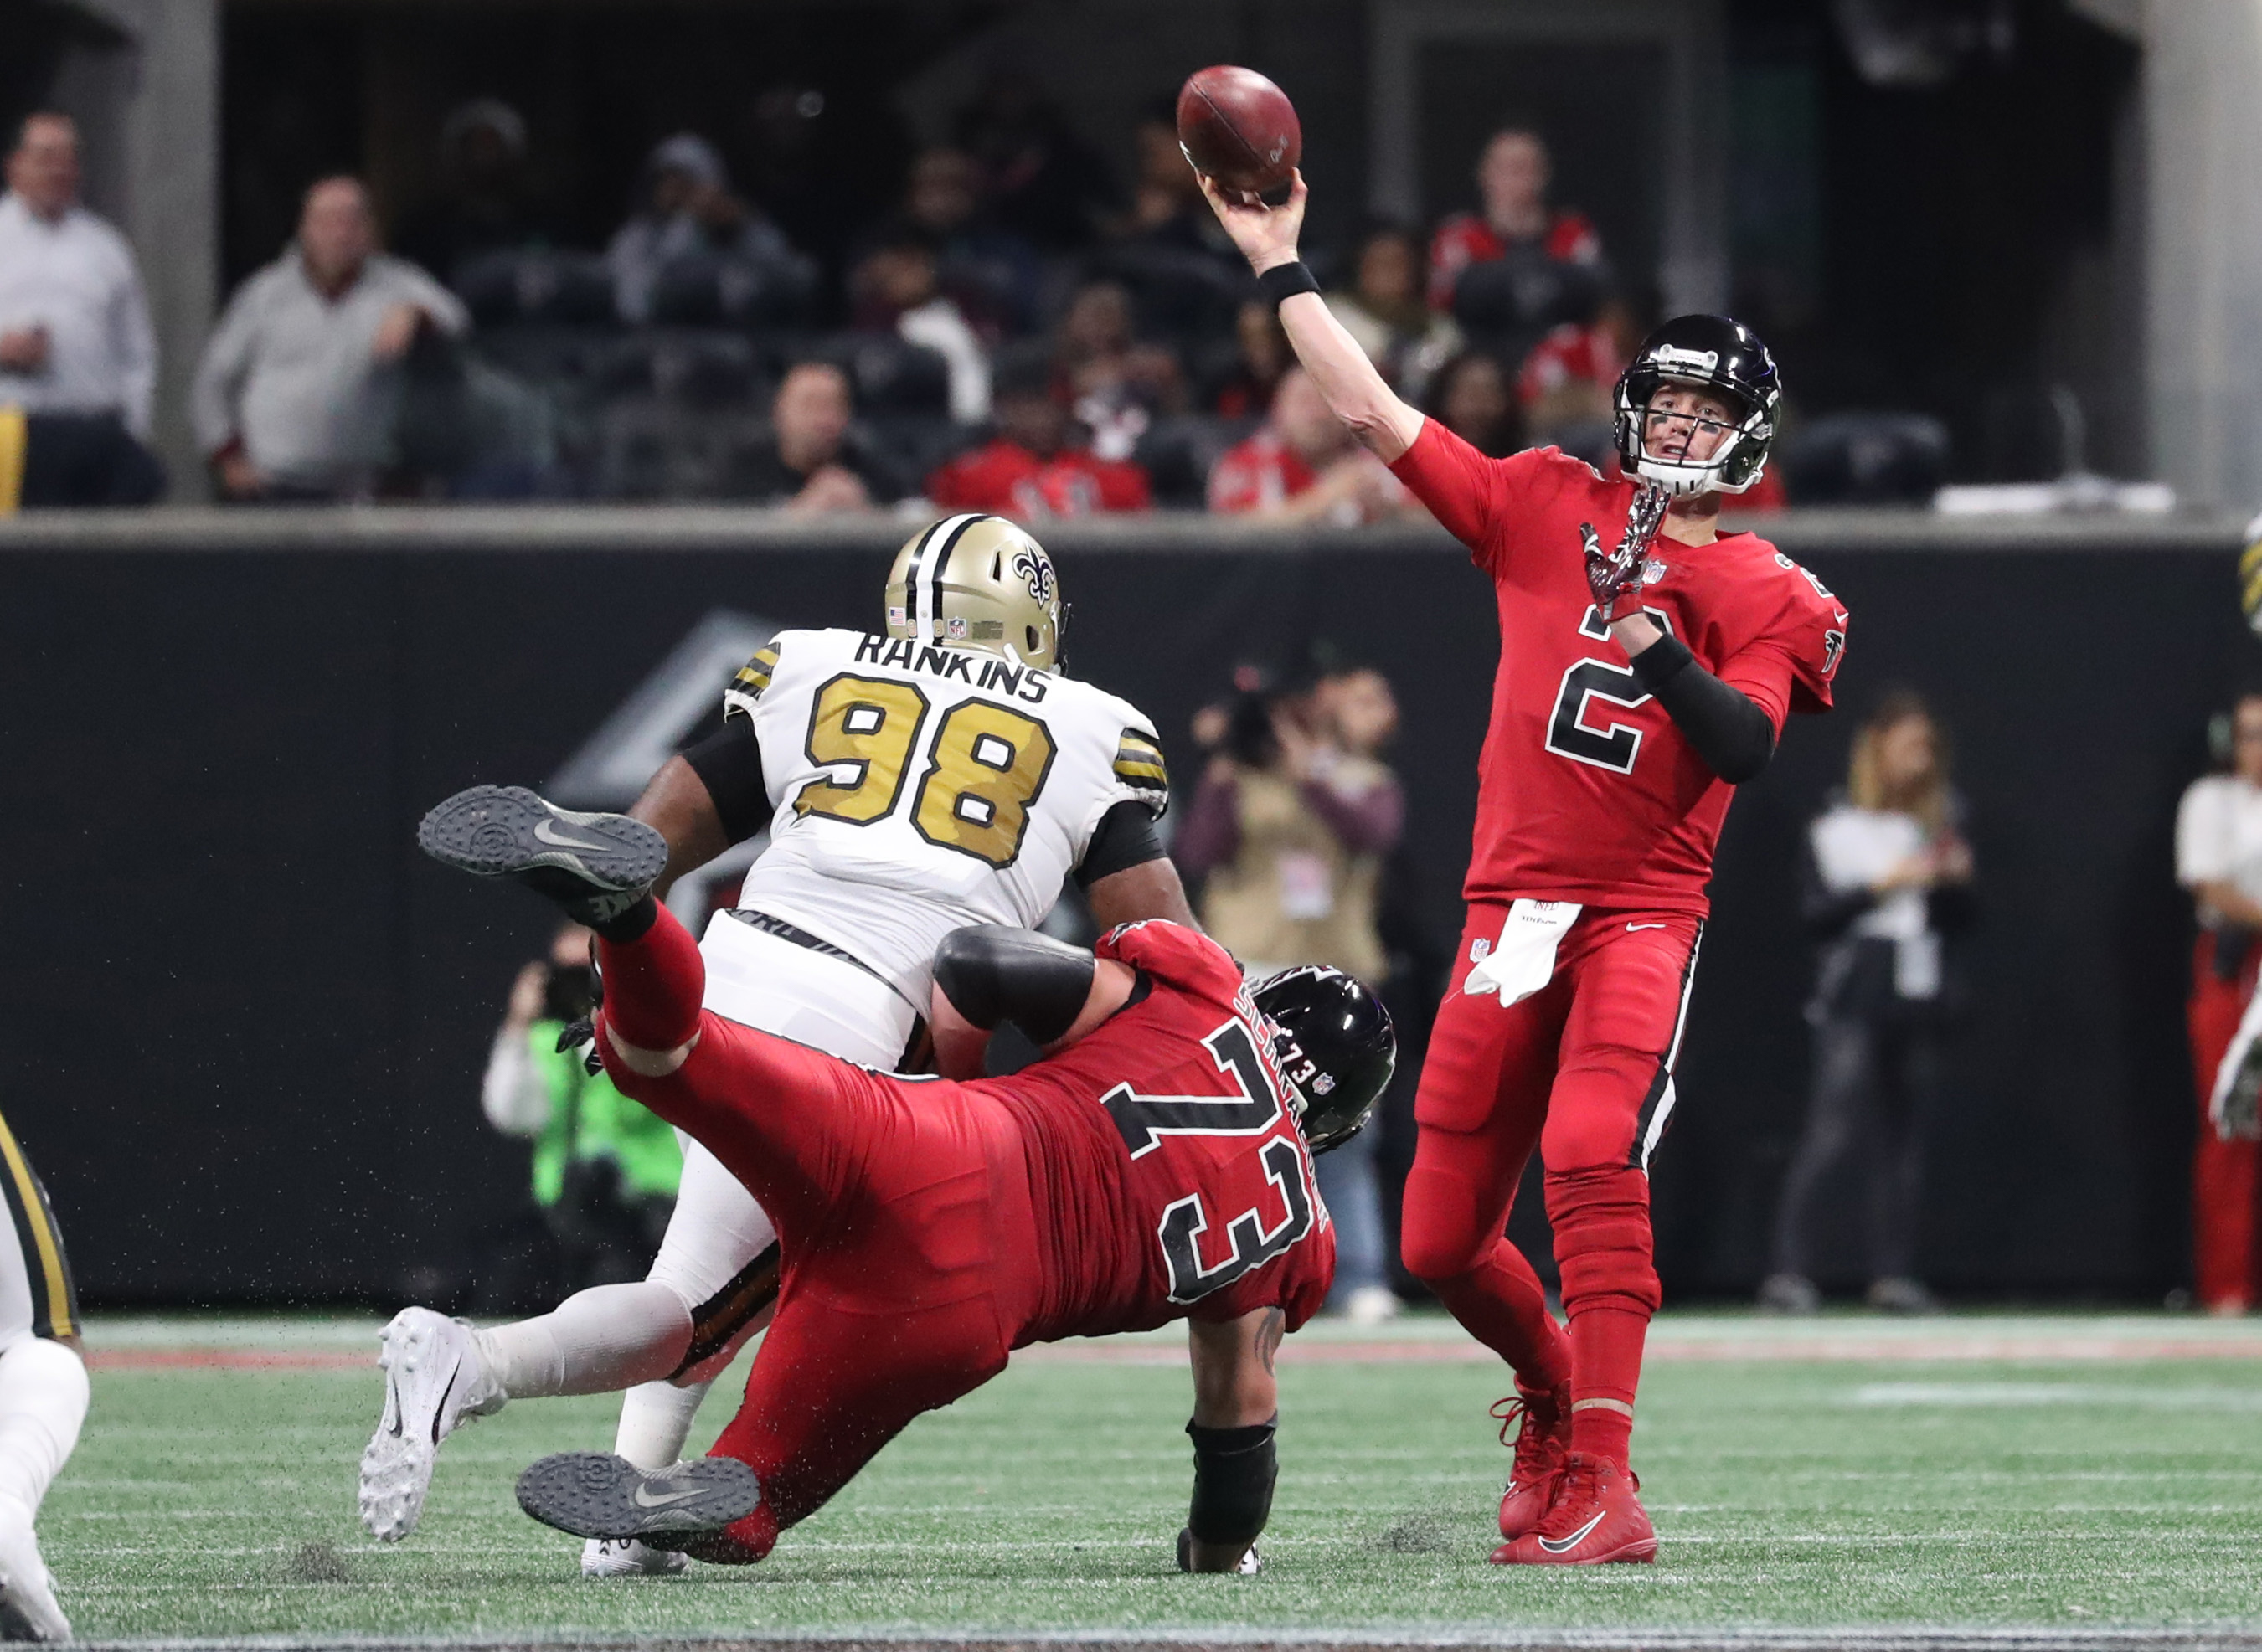 Falcons Beat Saints, Rashad Jennings Retires, Season Ticket Holder Becomes Emergency Goalie